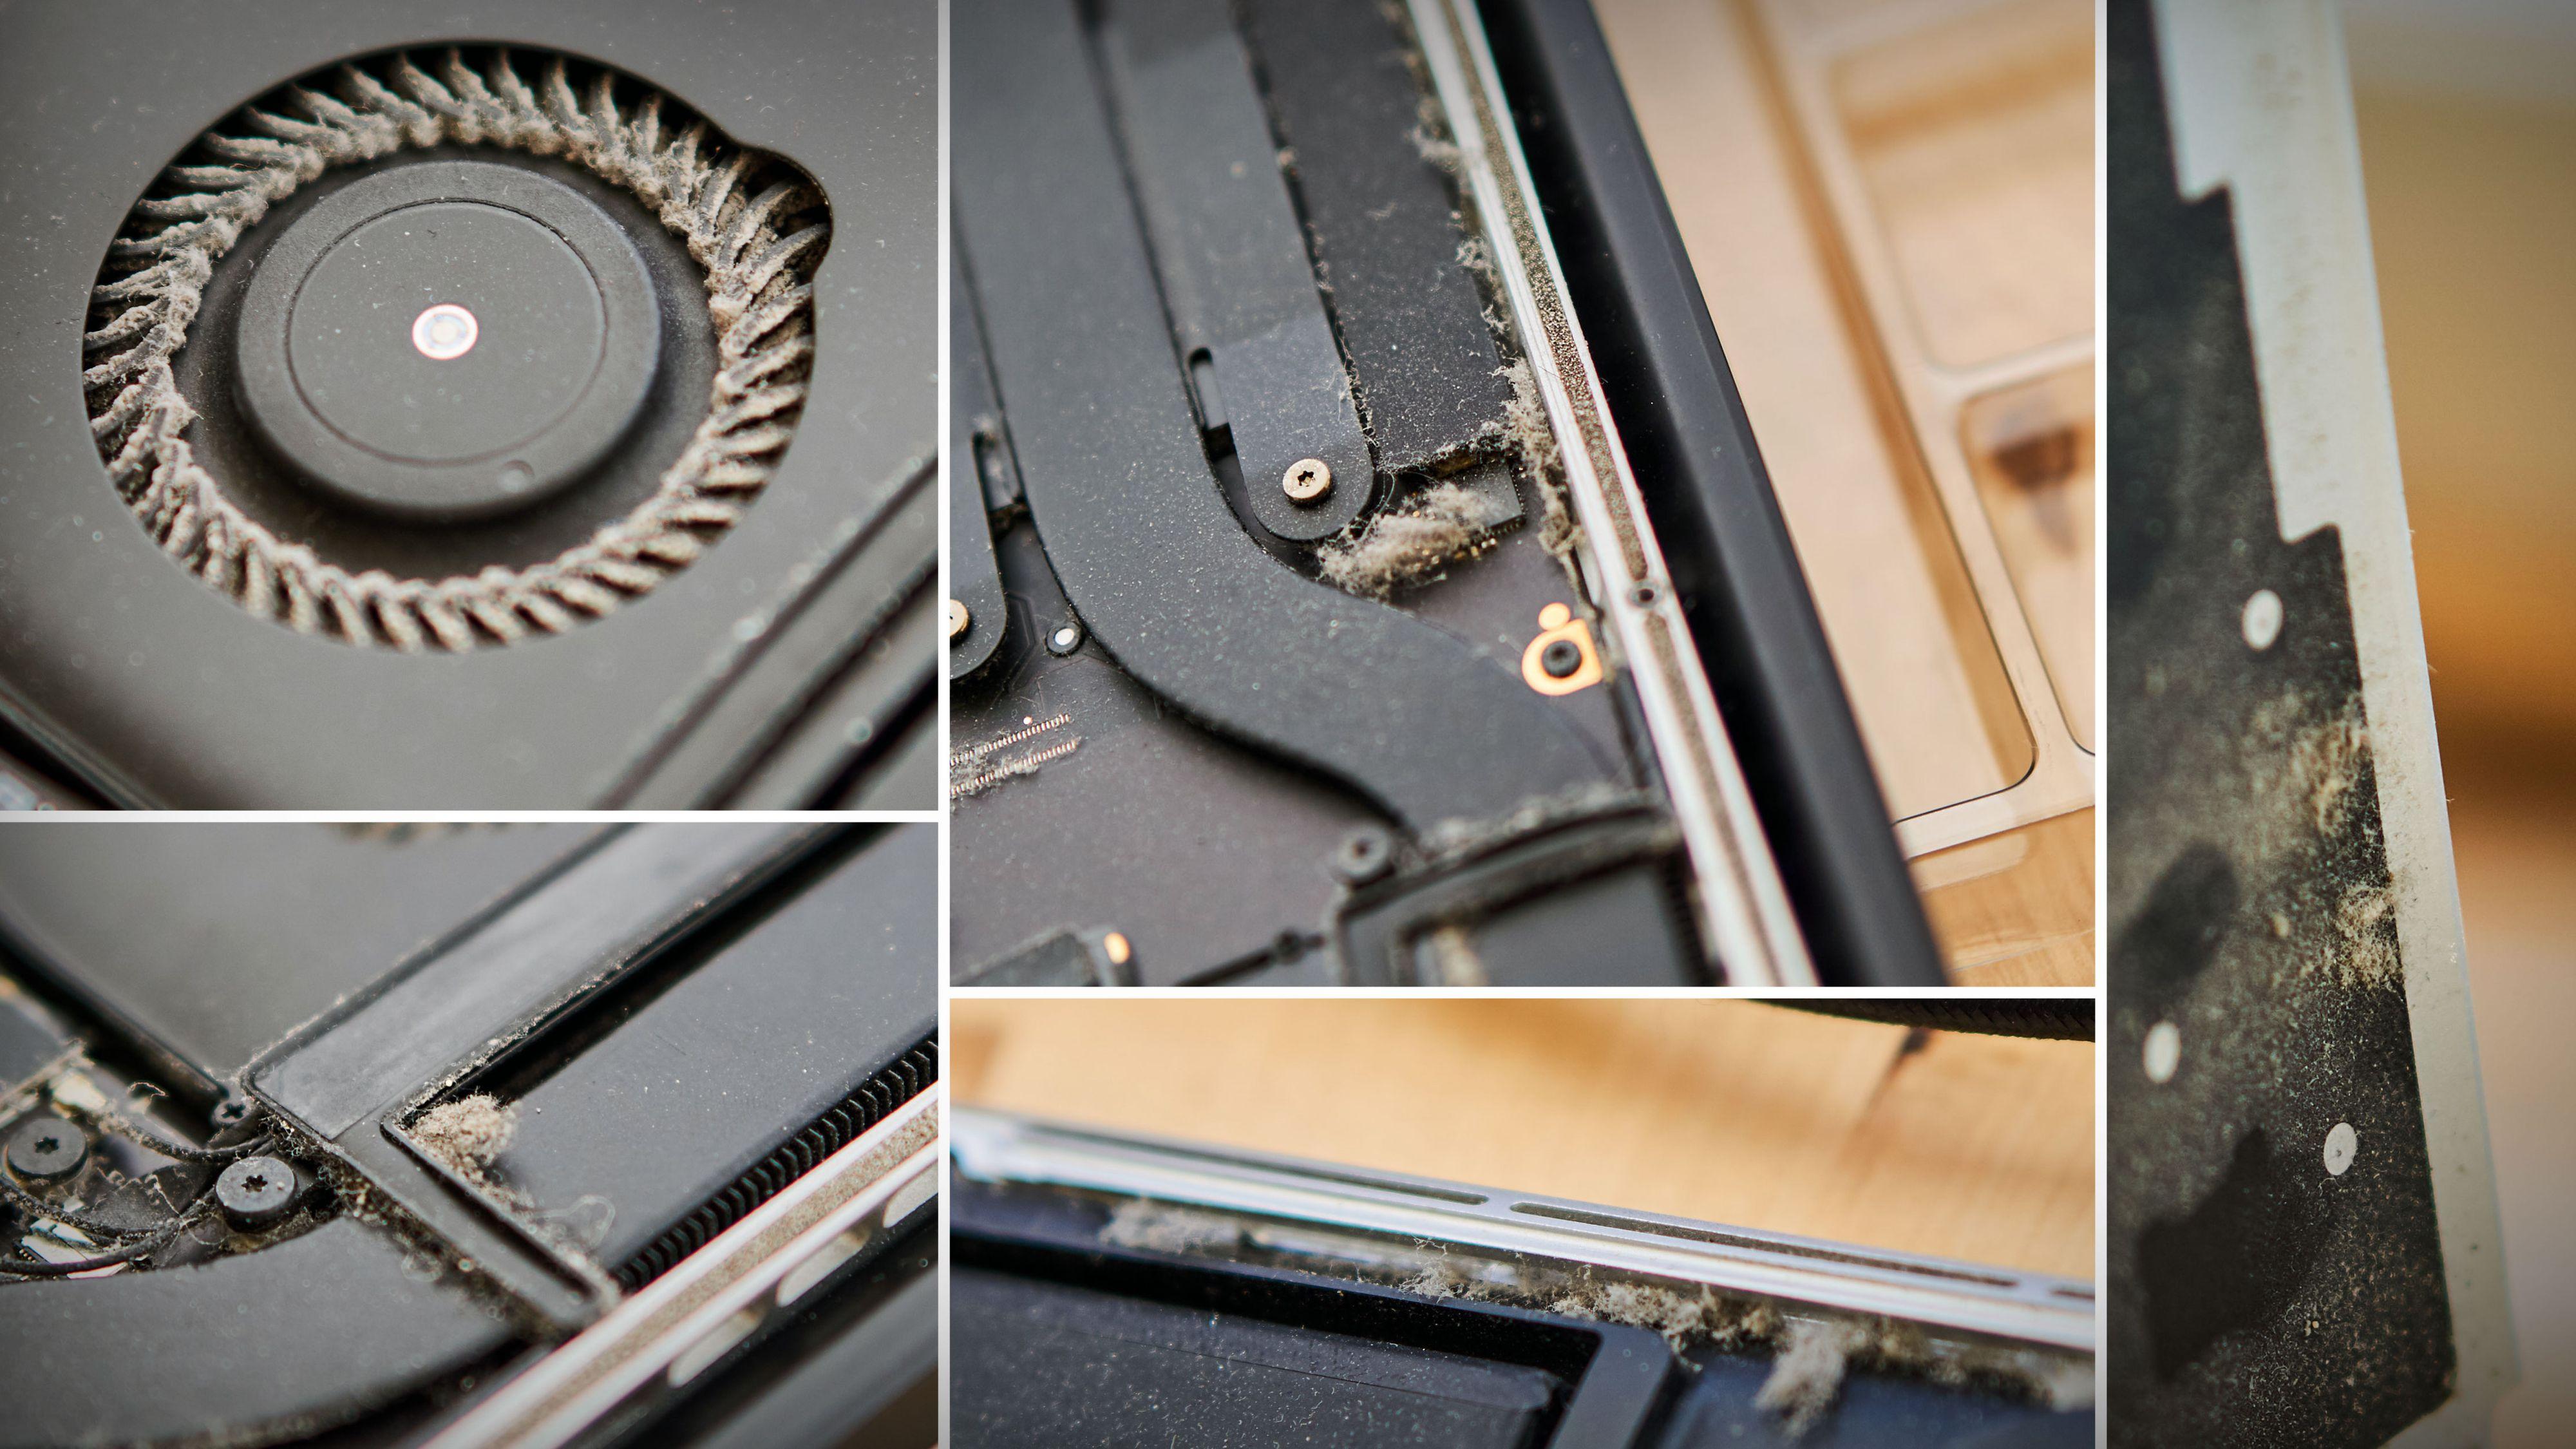 Vi totalrenoverte en MacBook Pro for under 1.000 kroner